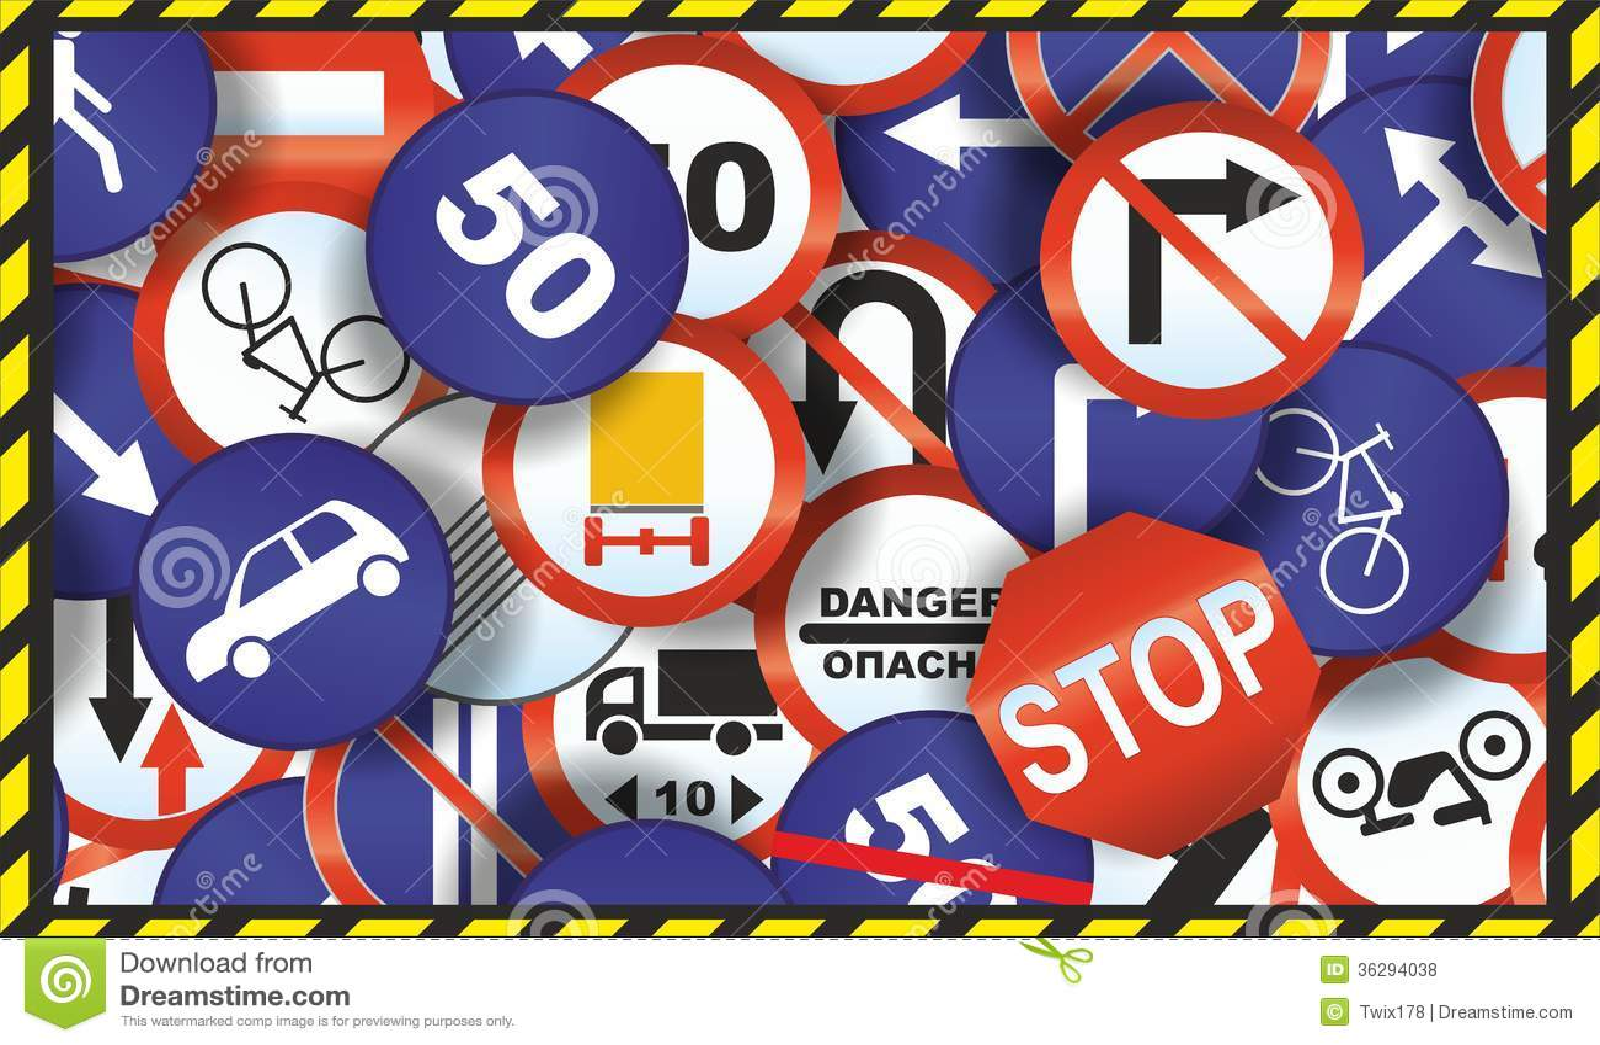 3d Printing Wallpaper Hd Wallpaper Of Traffic Signs Stock Photo Image Of Signpost